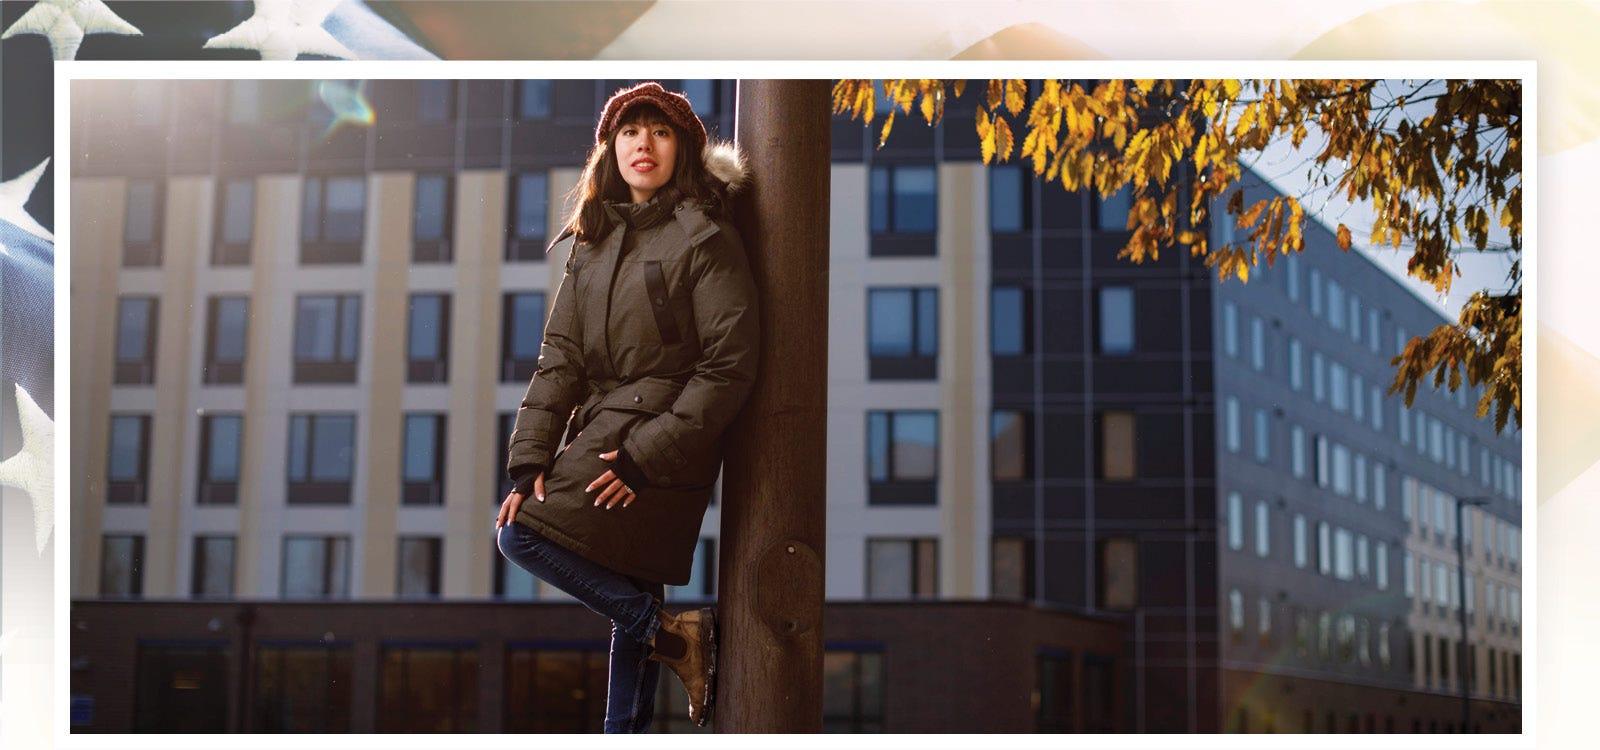 Student Leslie Hurtado is photographed on the campus of Northeastern Illinois University on Nov. 12, 2019.